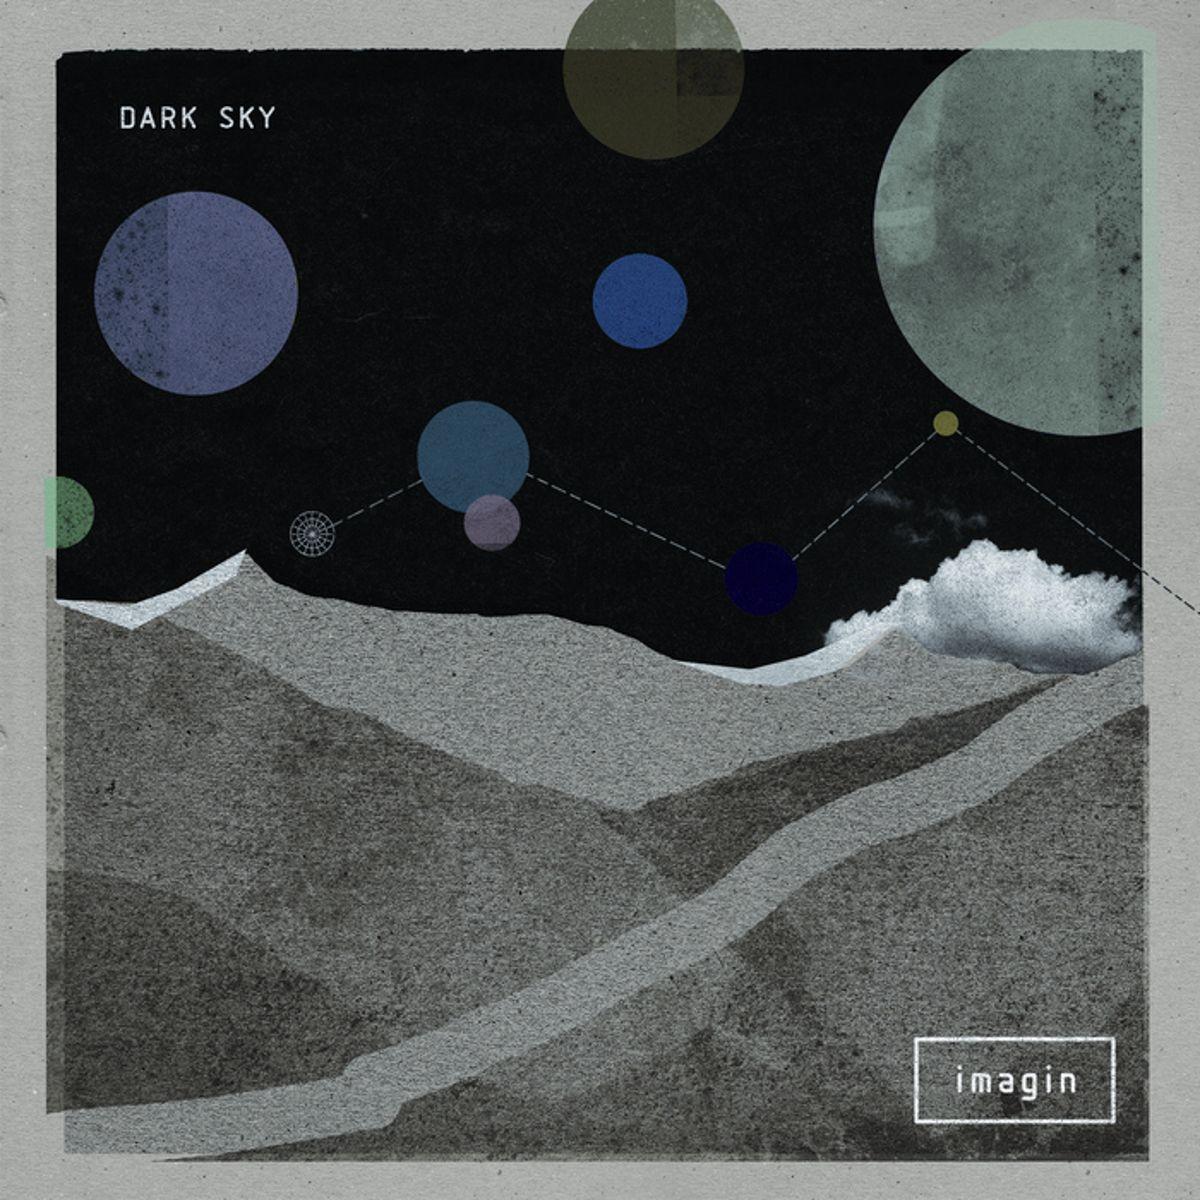 Dark Sky – Imagin